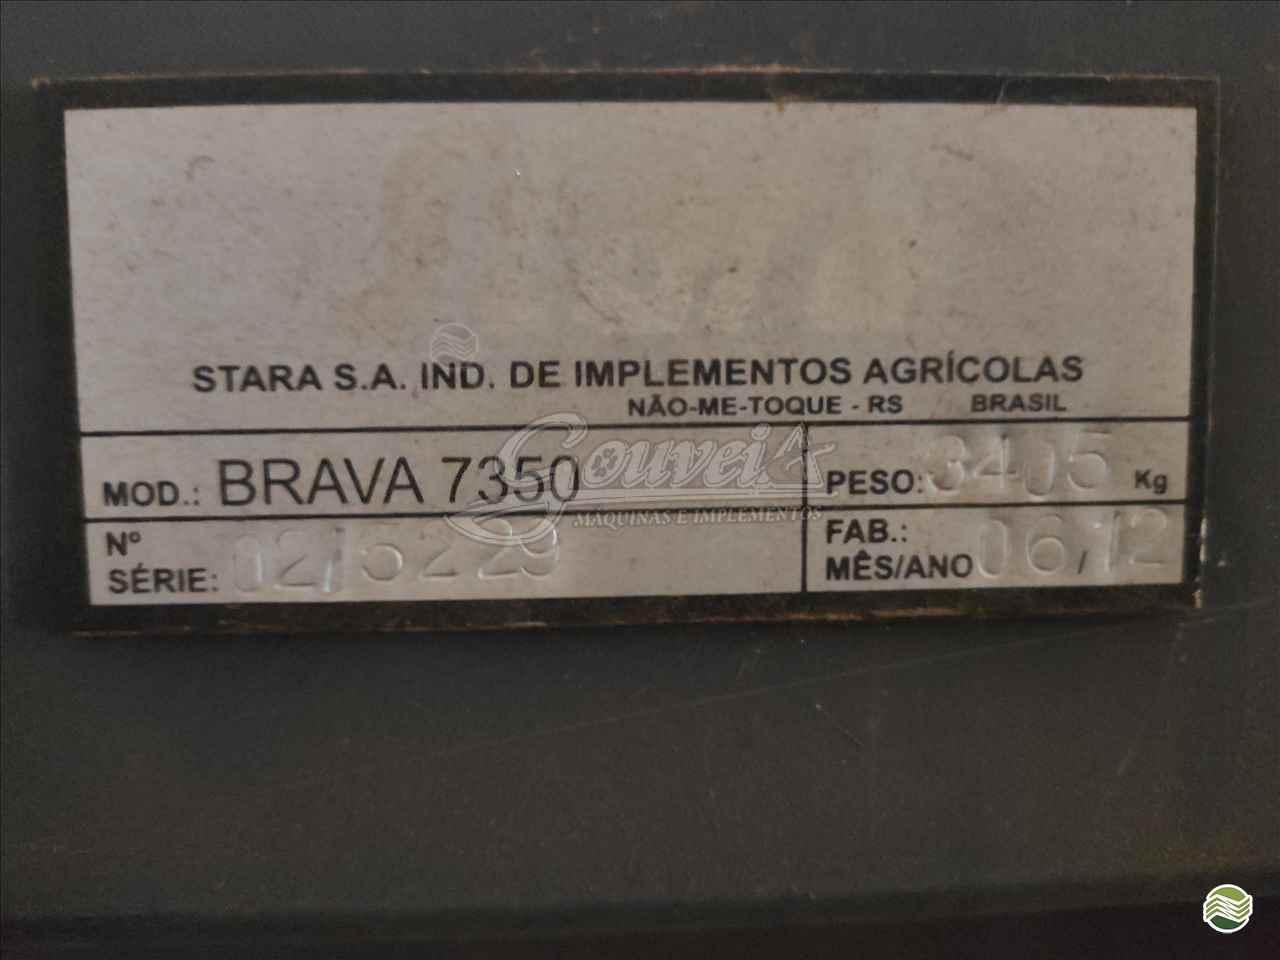 STARA BRAVA 7830  2012/2012 Gouveia Máquinas e Implementos Agrícolas - Jacto